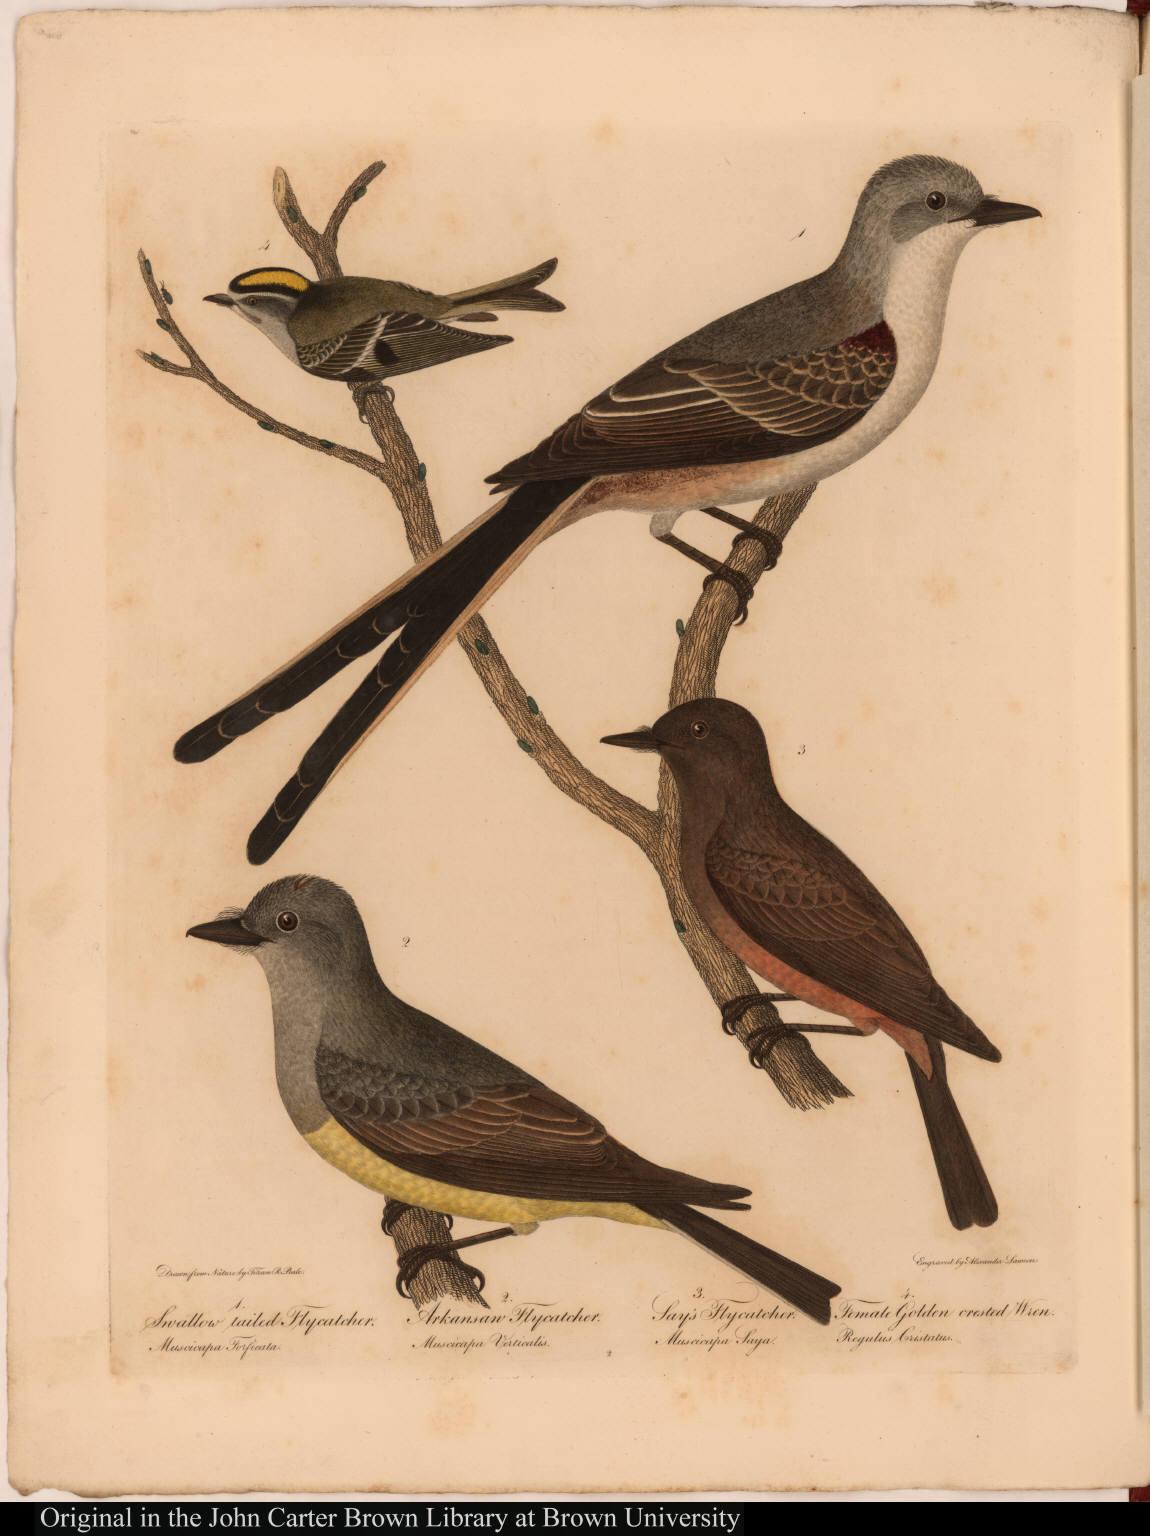 1. Swallow tailed Flycatcher. Muscicapa Forficata. 2. Arkansaw Flycatcher. Muscicapa Verticalis. 3. Say's Flycatcher. Muscicapa Saya. 4. Female Golden crested Wren. Regulus Cristatus.